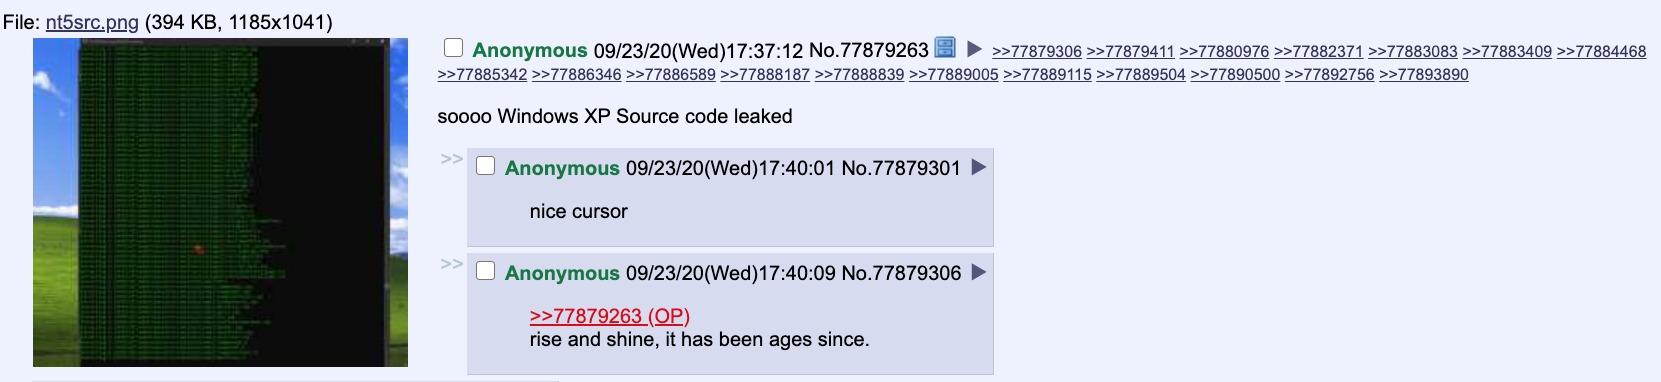 Windows XP 4chan filtración